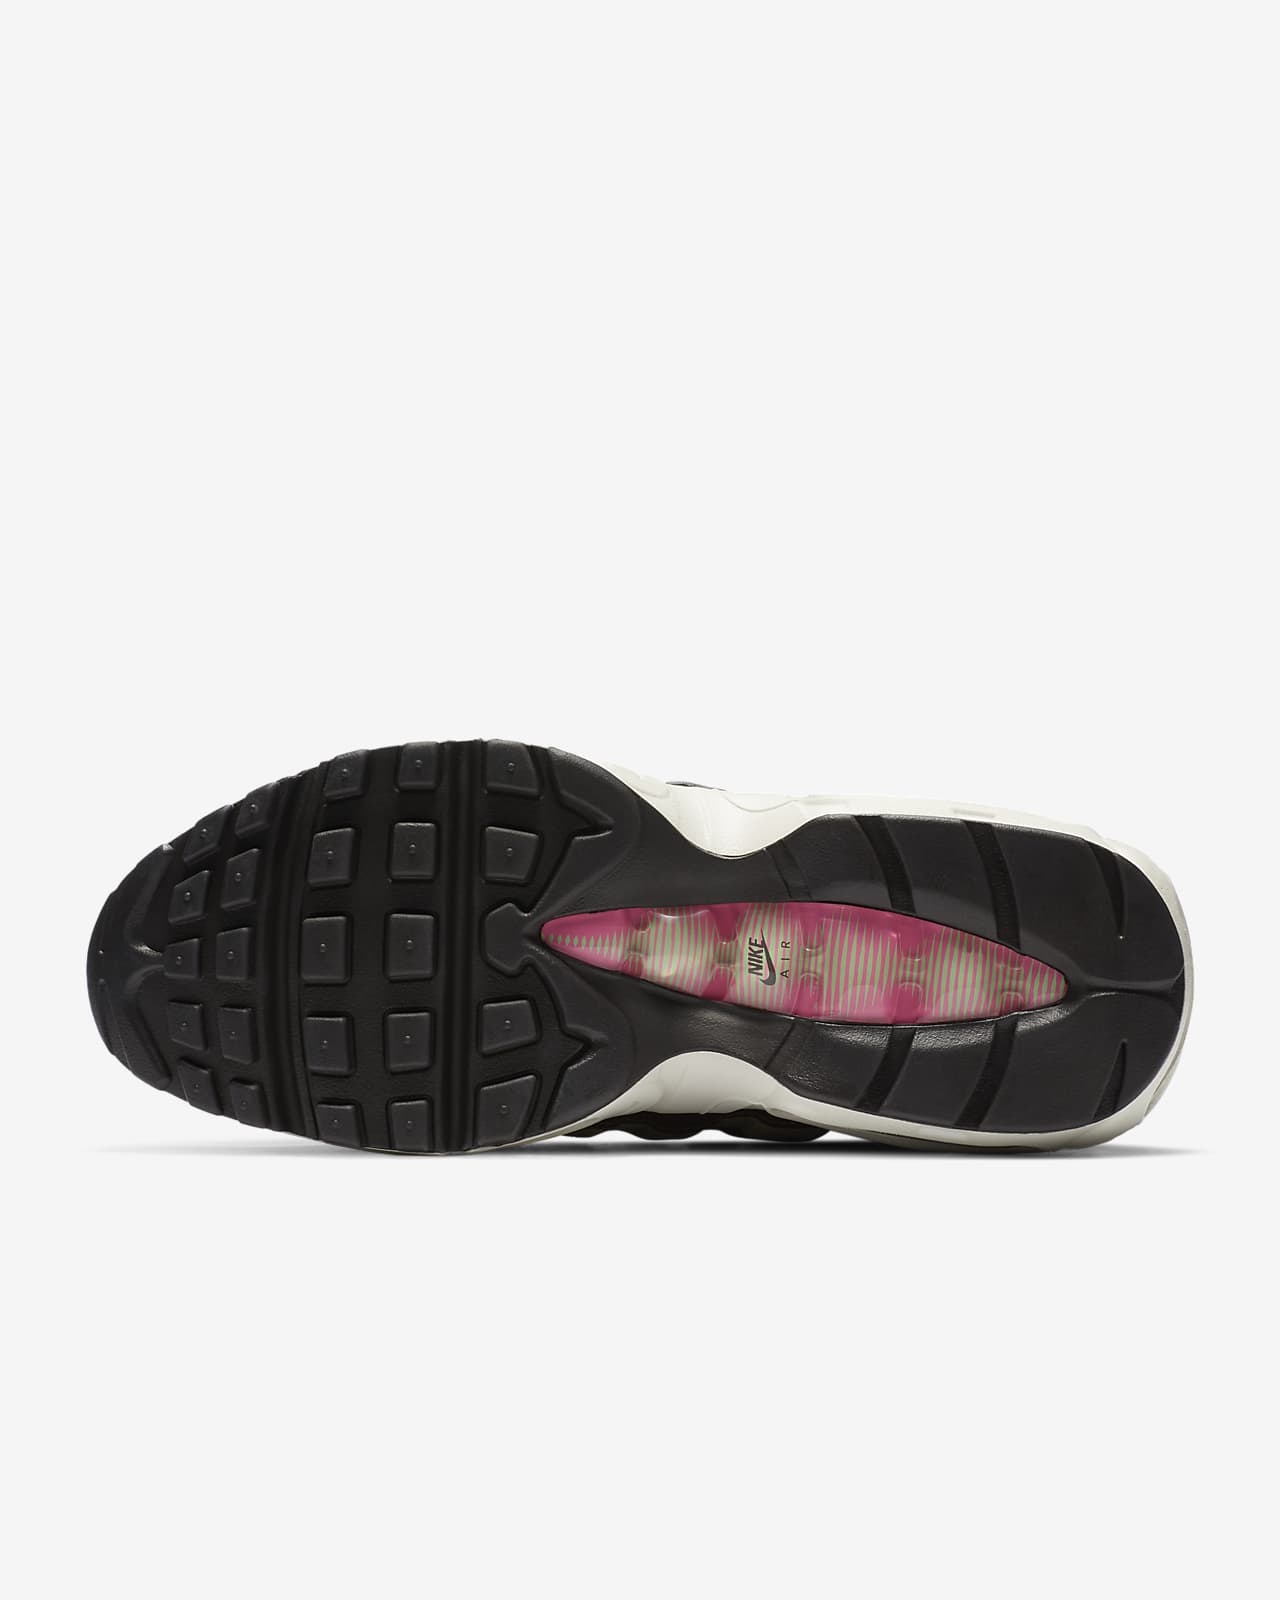 Nike Air Max 95 Premium Women's Shoes. Nike LU